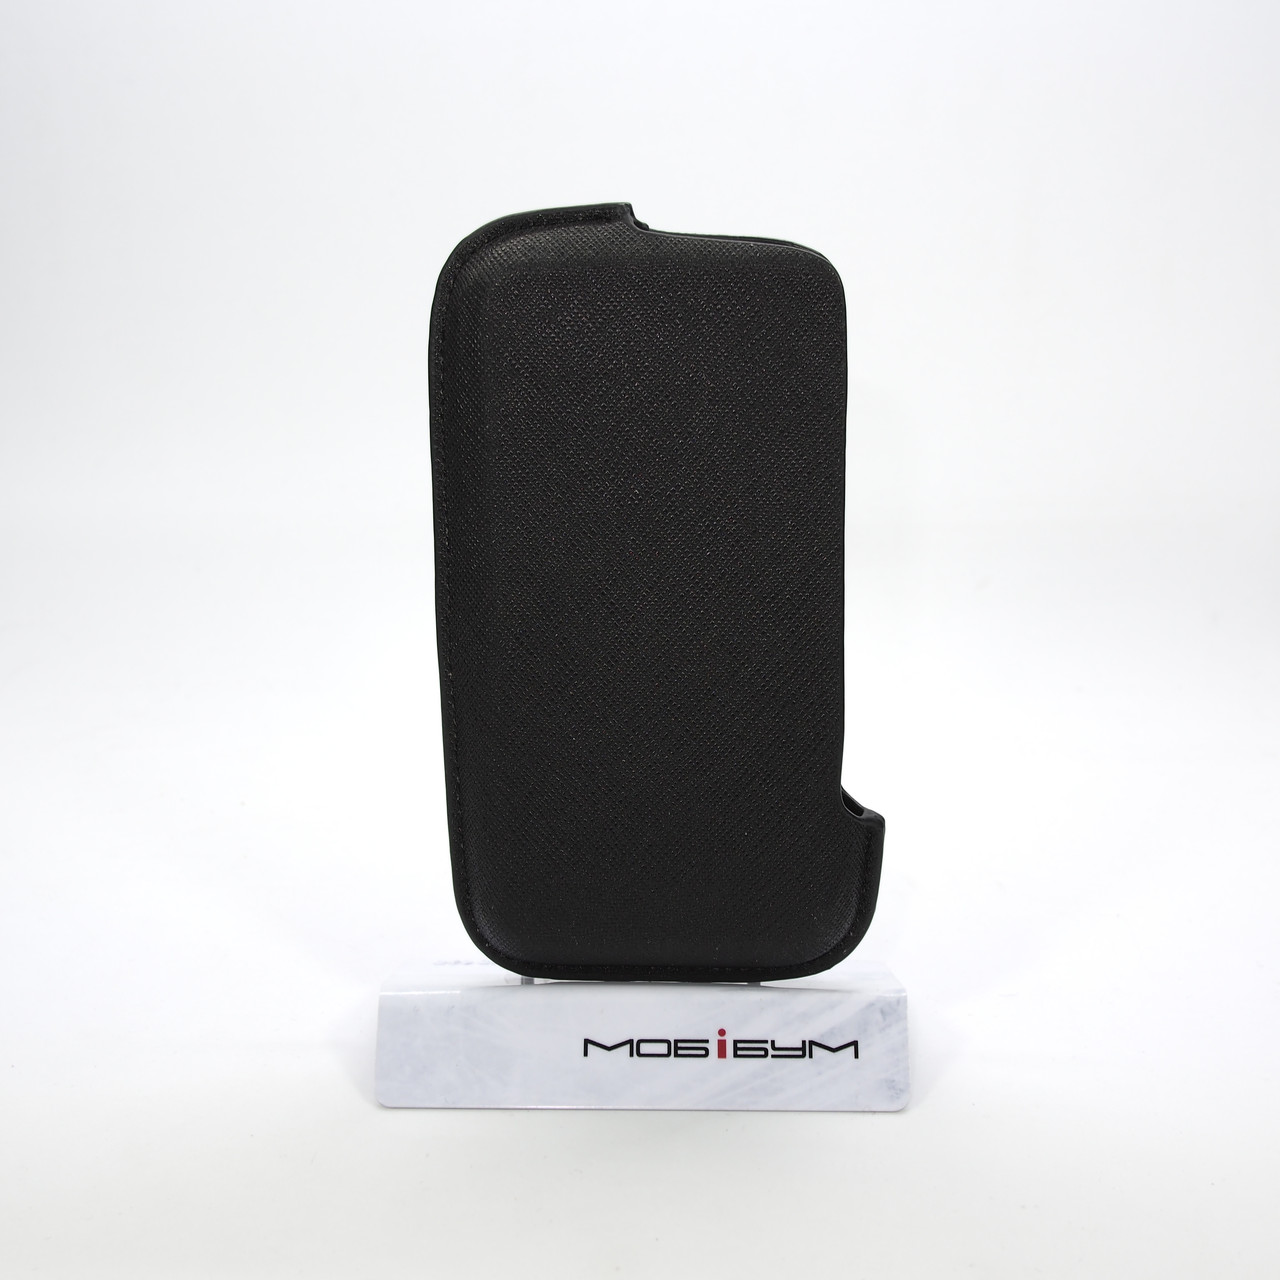 Чехлы для Nokia CP-506 C7 Protective Pouch black Для телефона